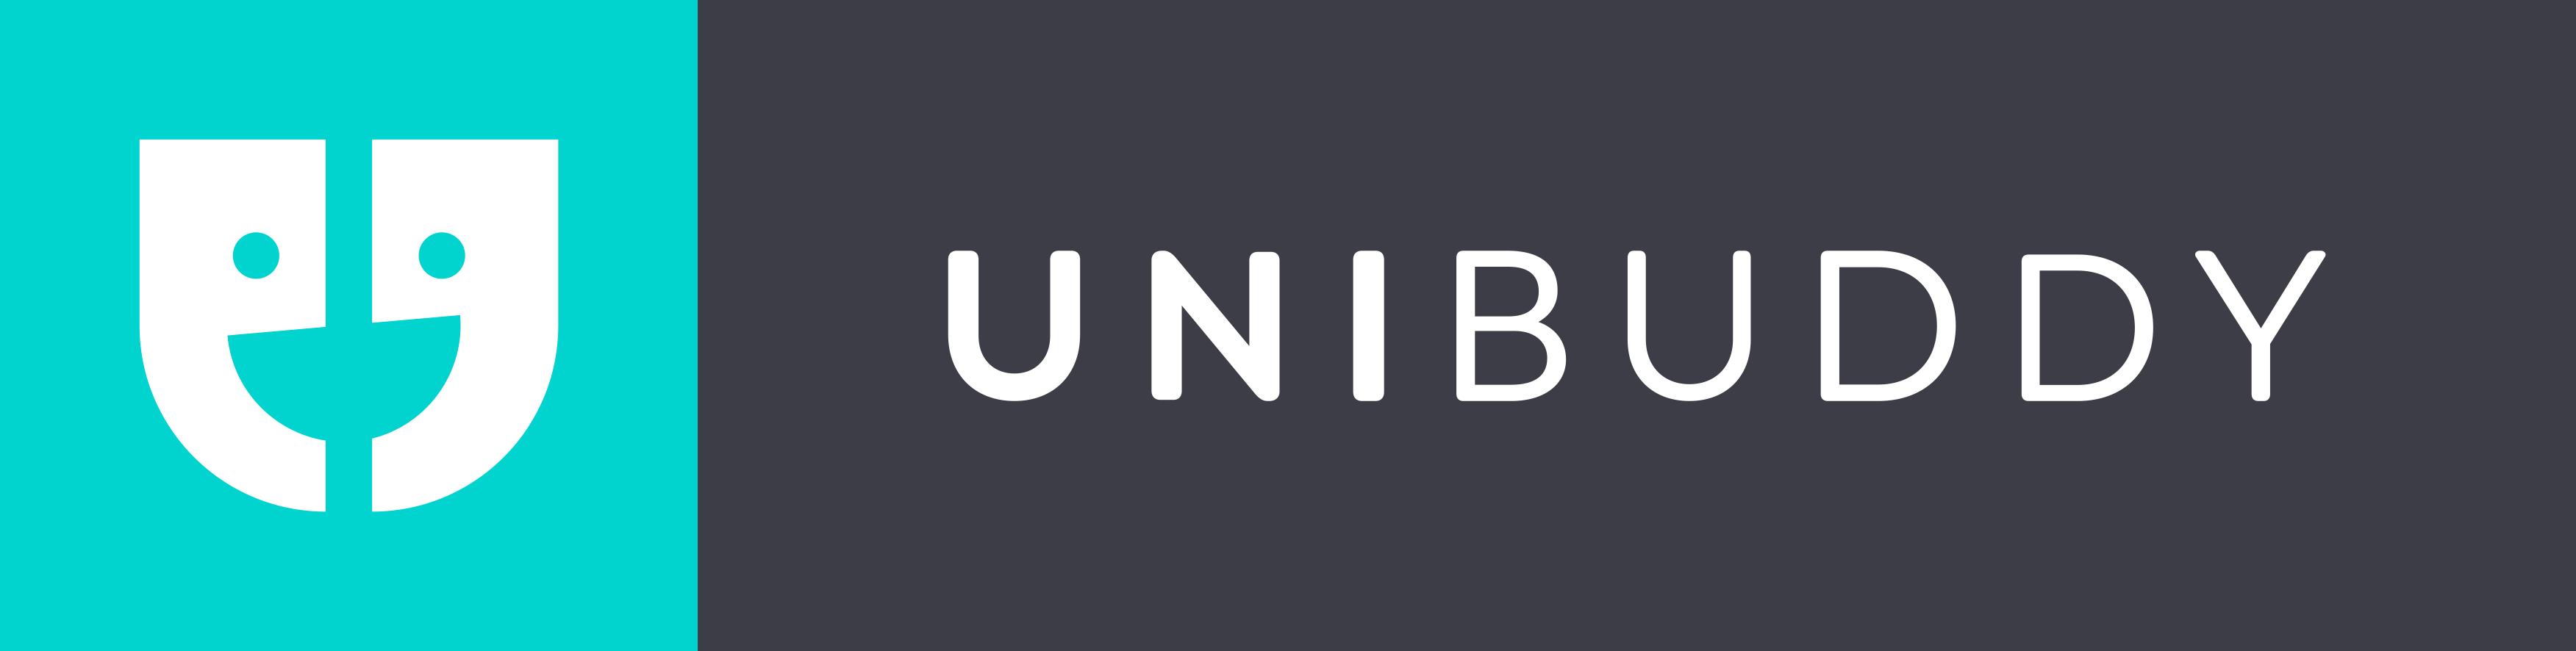 Unibuddy